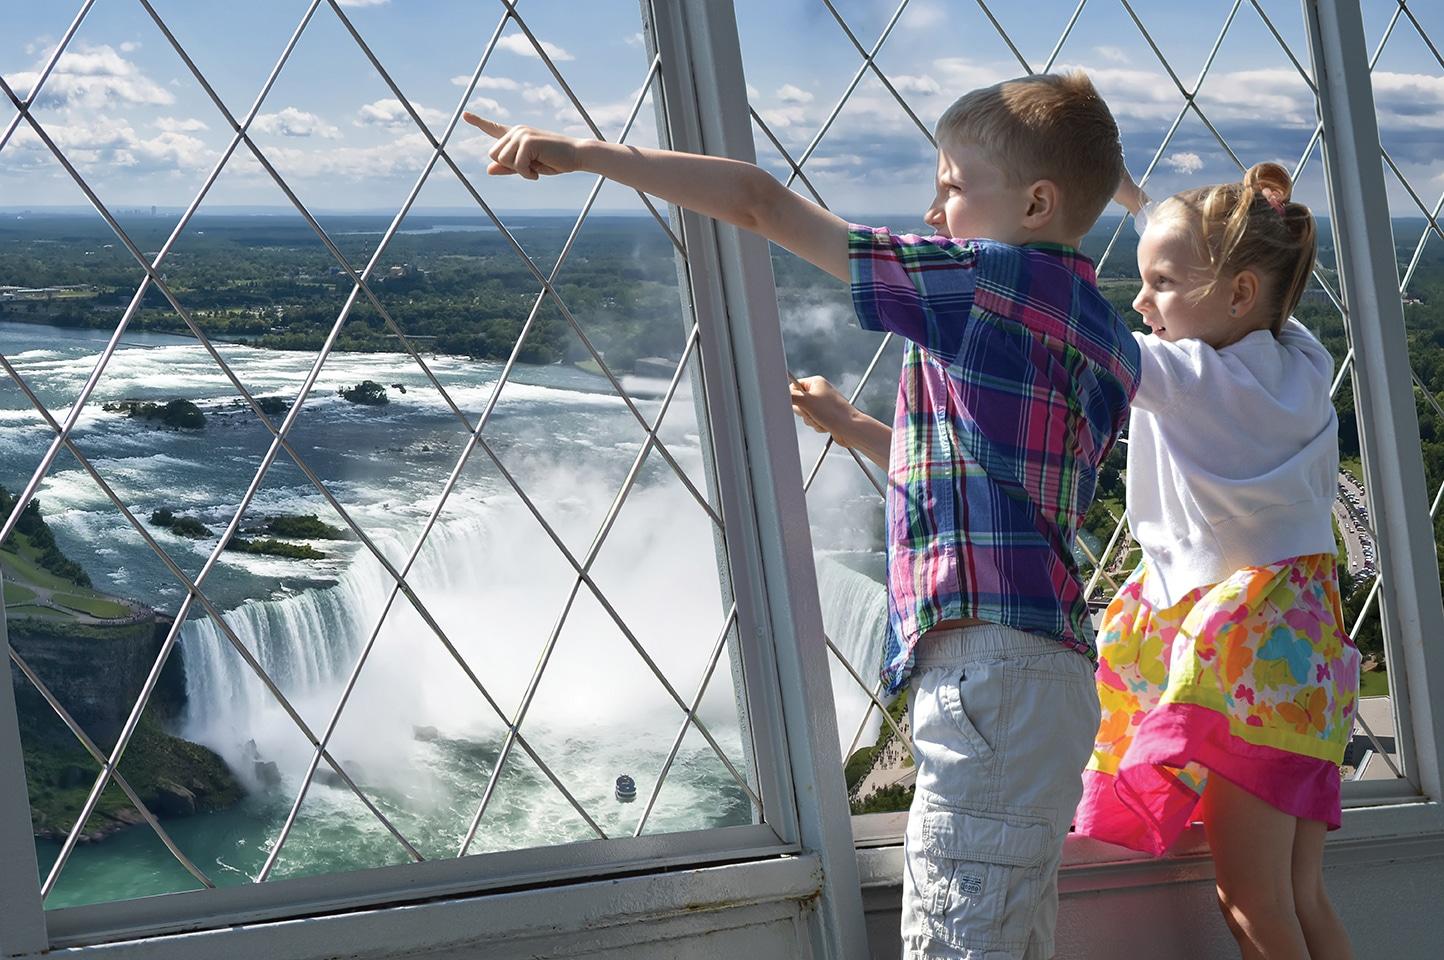 Observation Deck Skylon Tower Niagara Falls Attractions